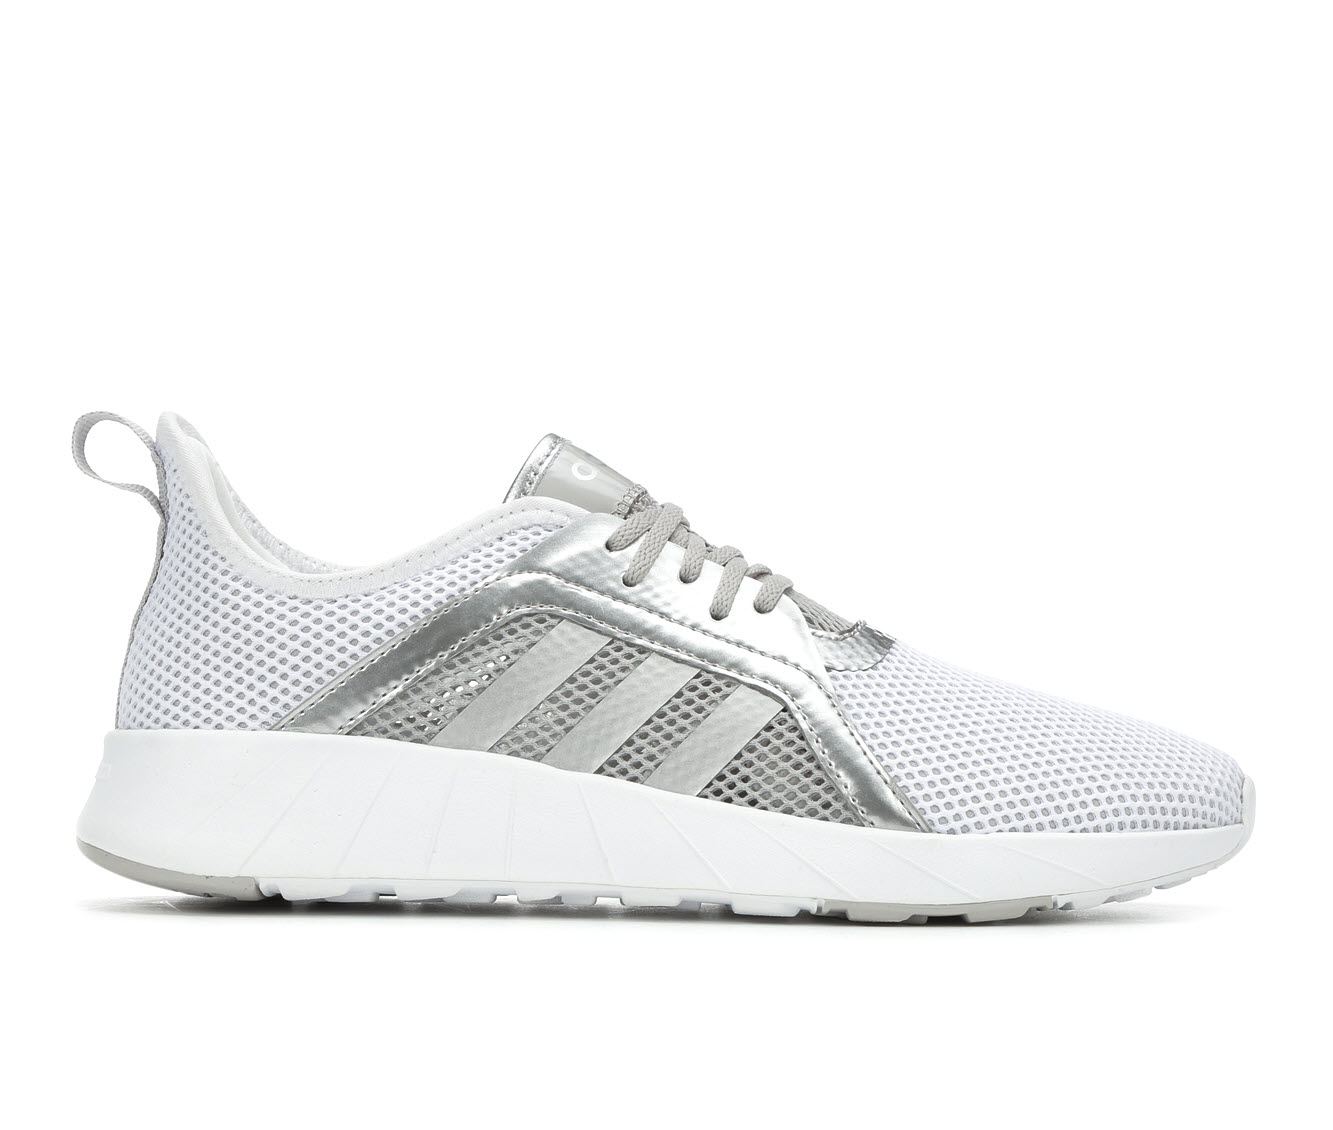 Adidas Khoe Run Women's Athletic Shoe (White)